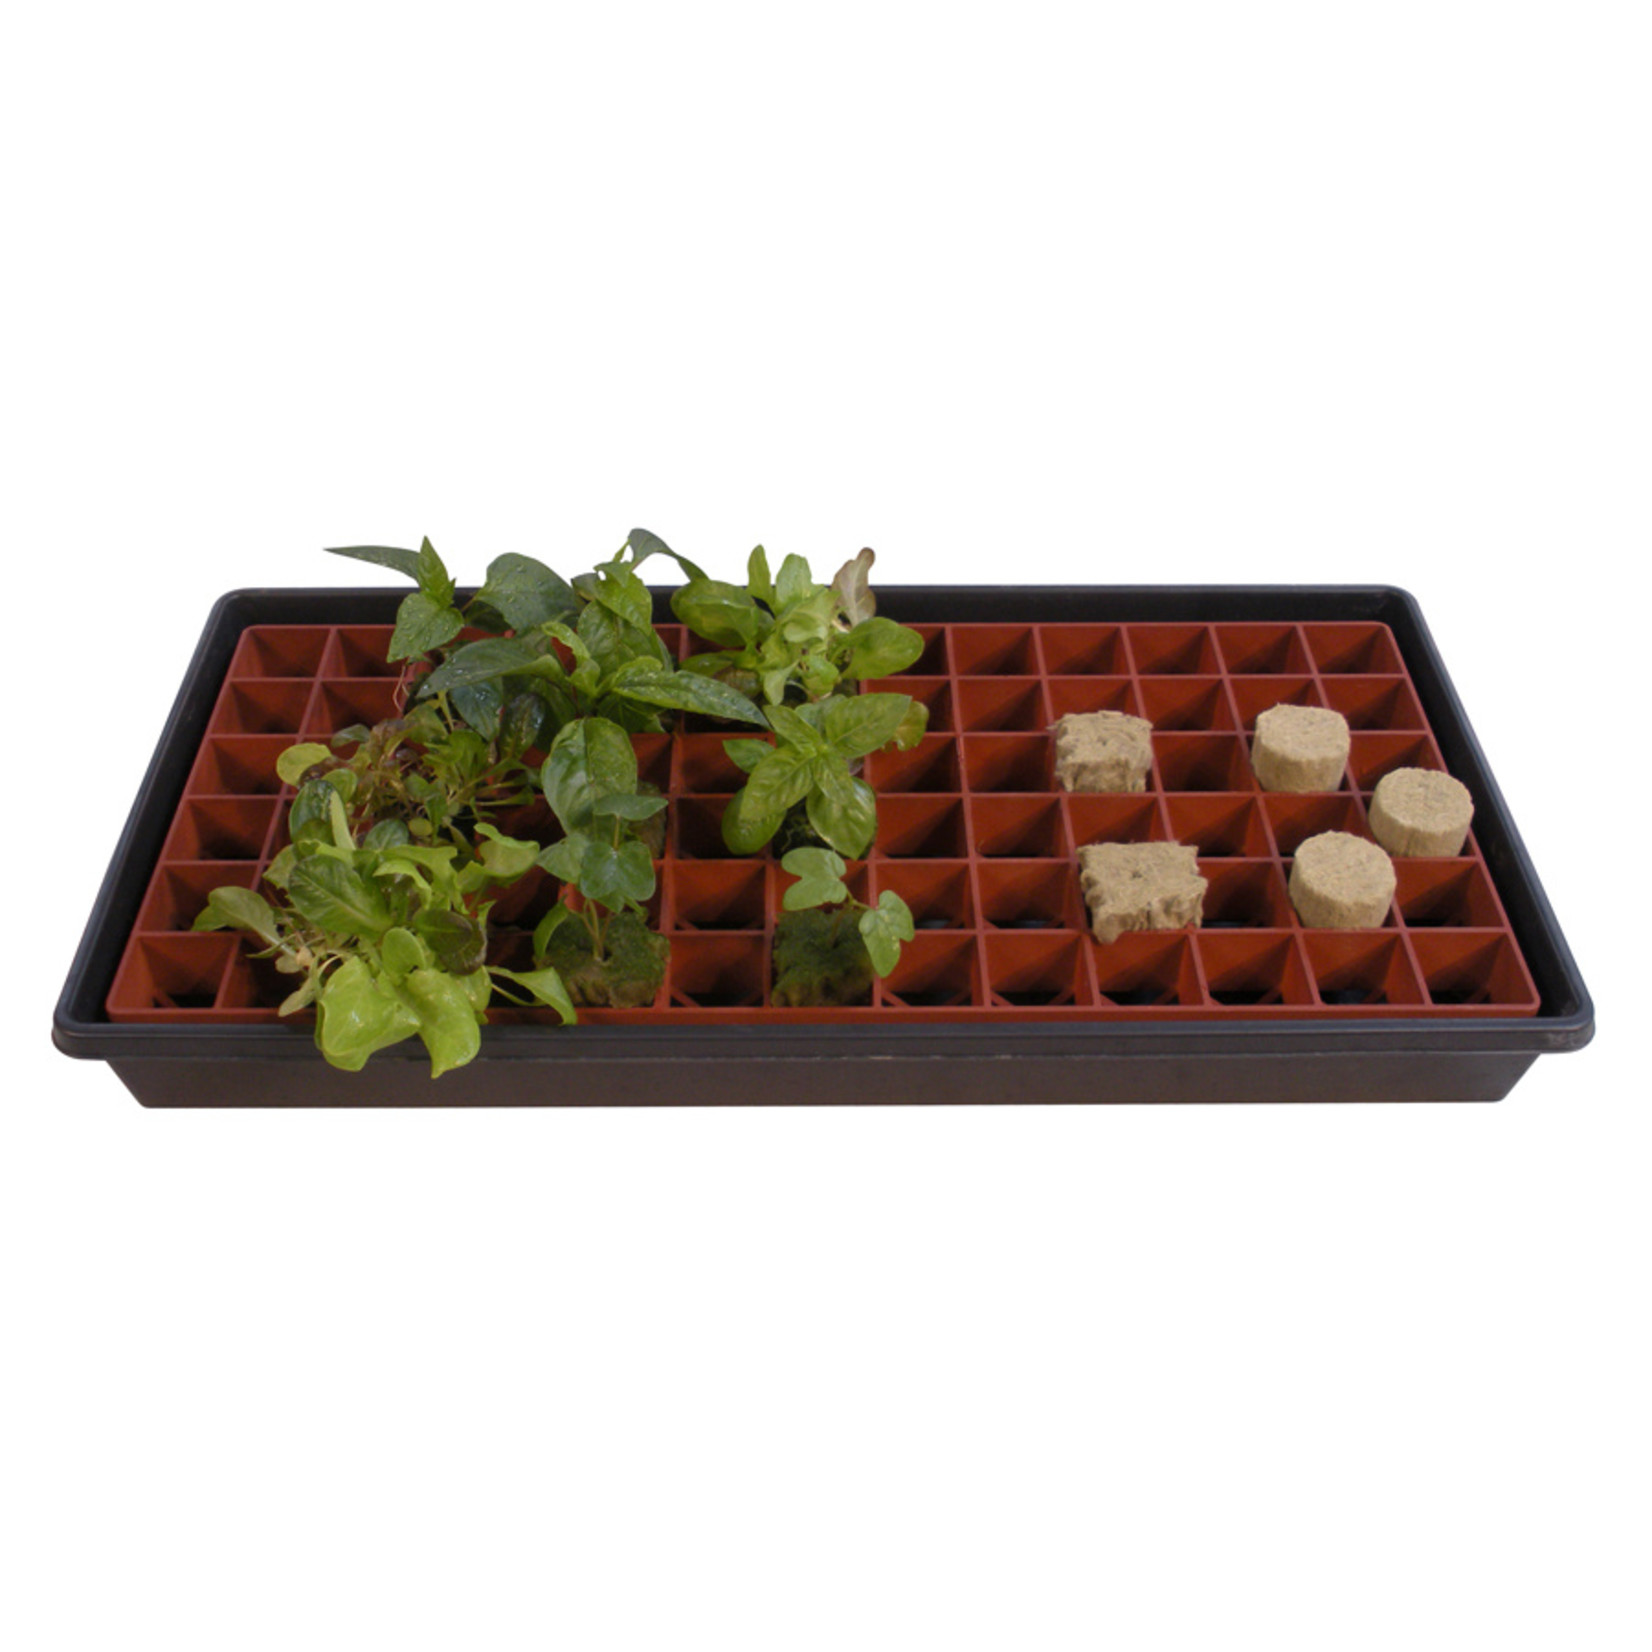 Grodan Grodan Gro-Smart Tray Insert